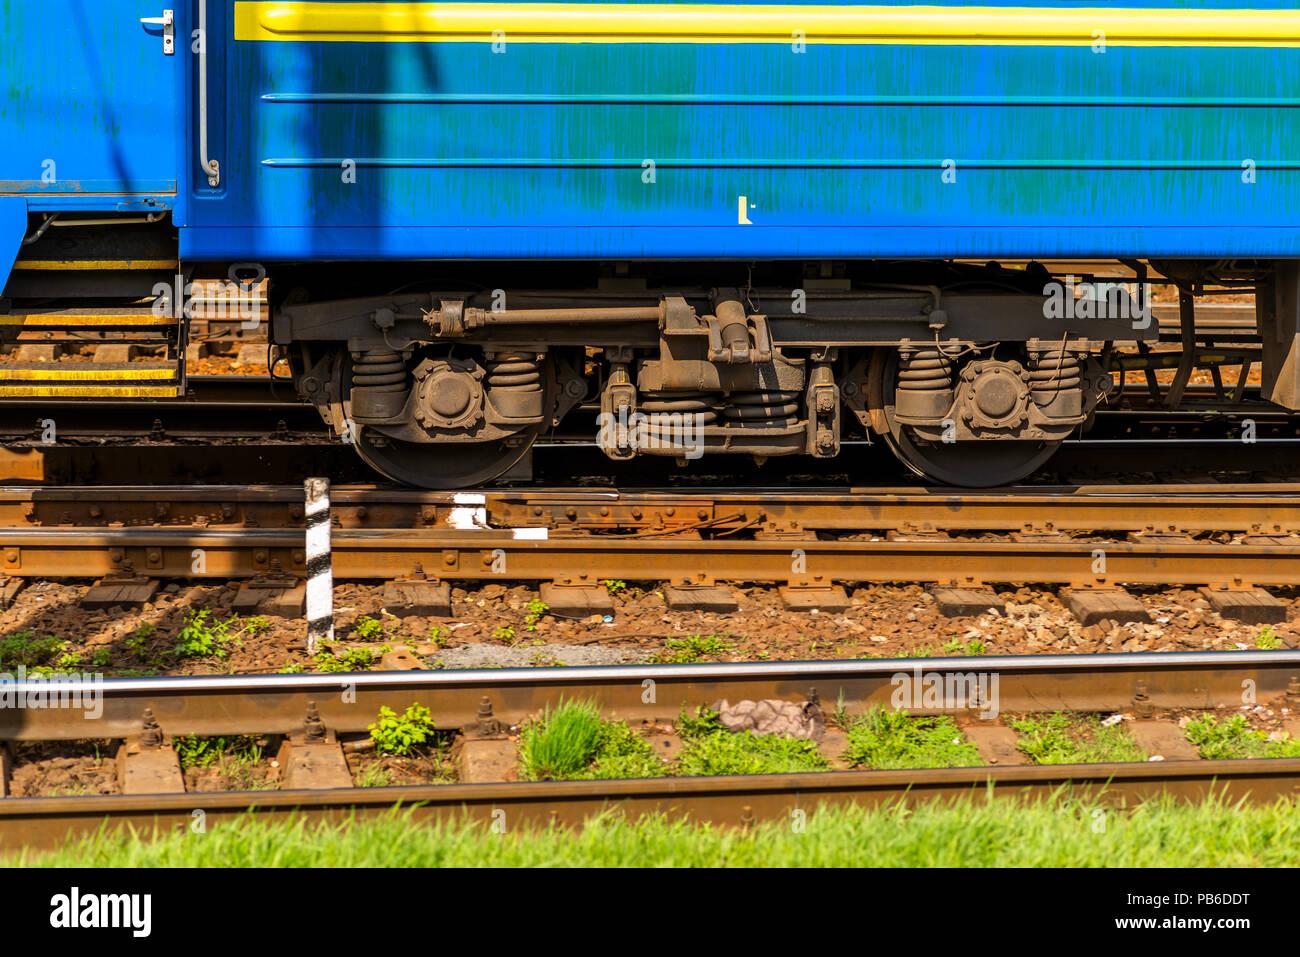 wheel-train of a train car - Stock Image